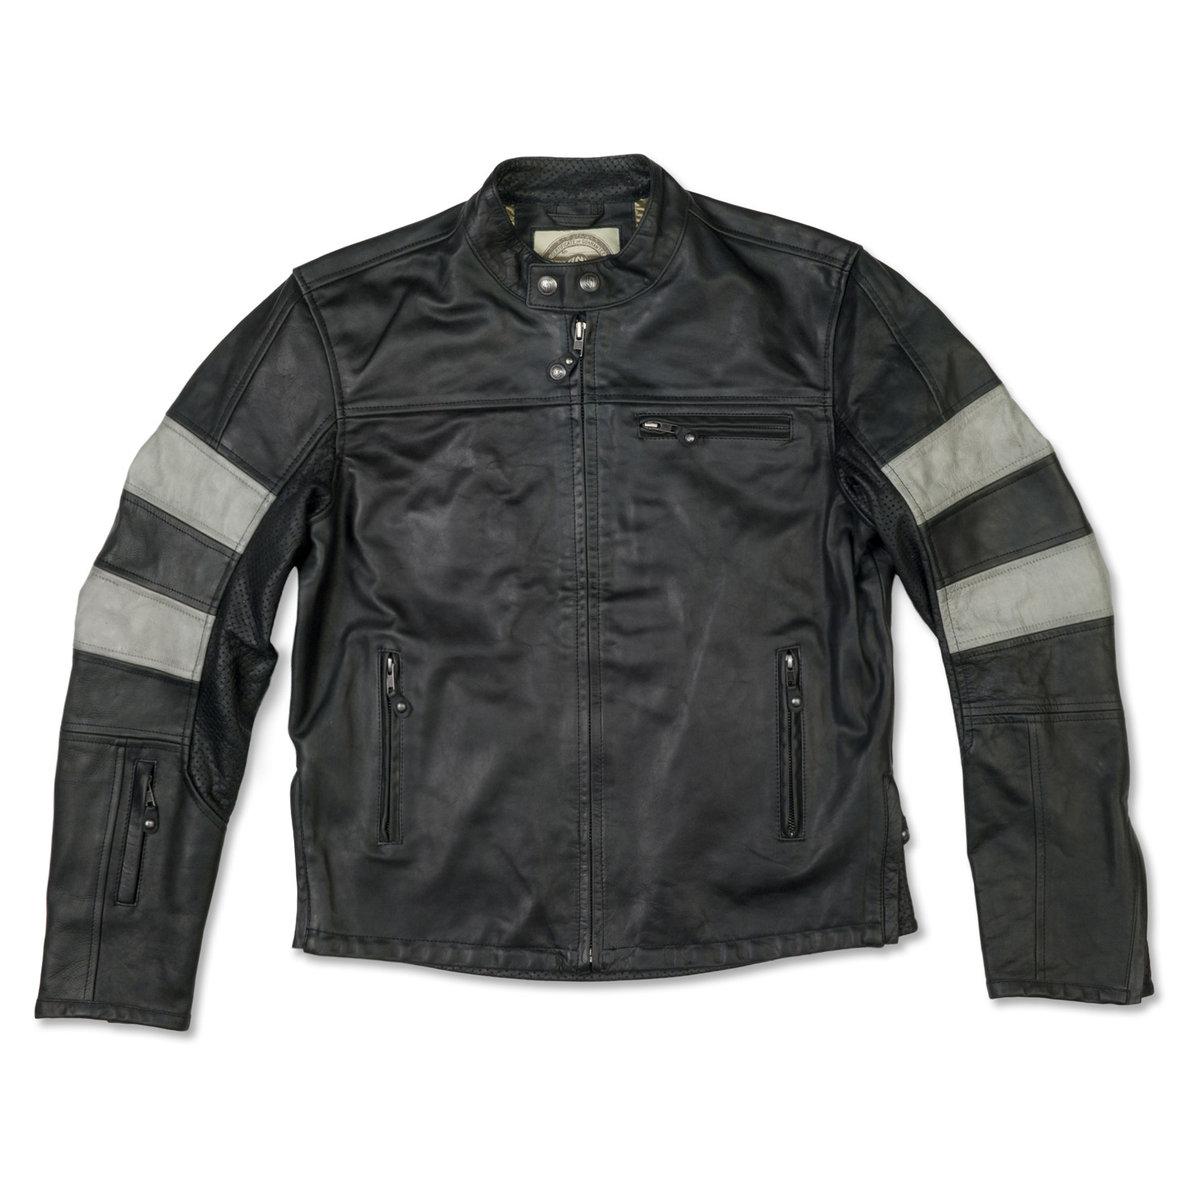 What jacket do you wear?-roland_sands_ronin_black_smoke__61442_zoom.jpg